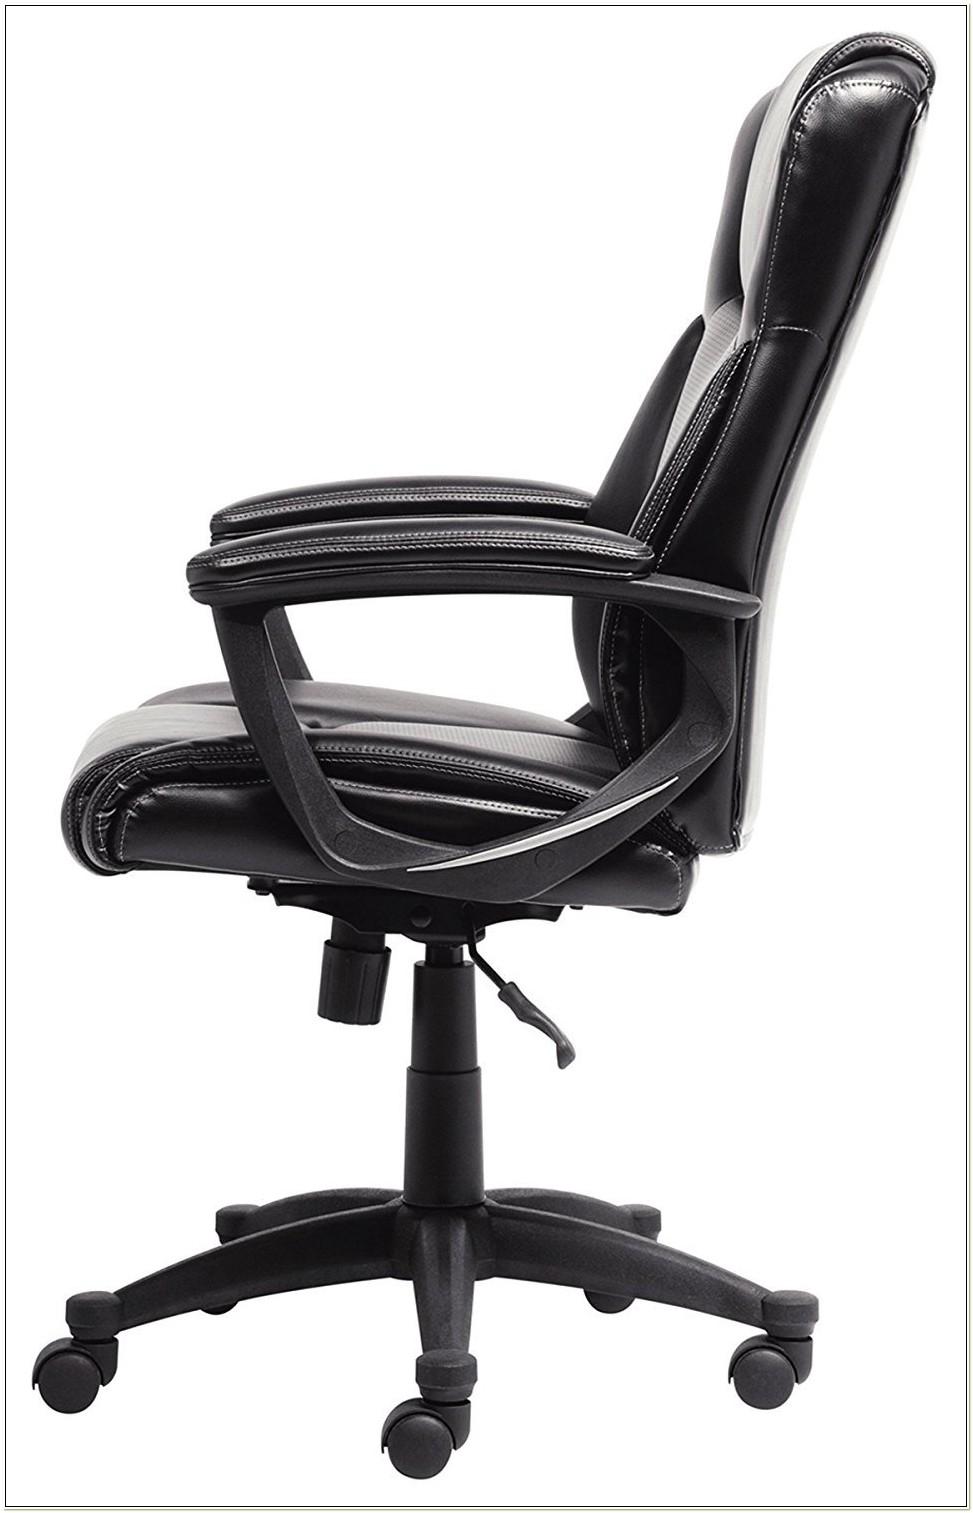 Serta High Back Executive Chair